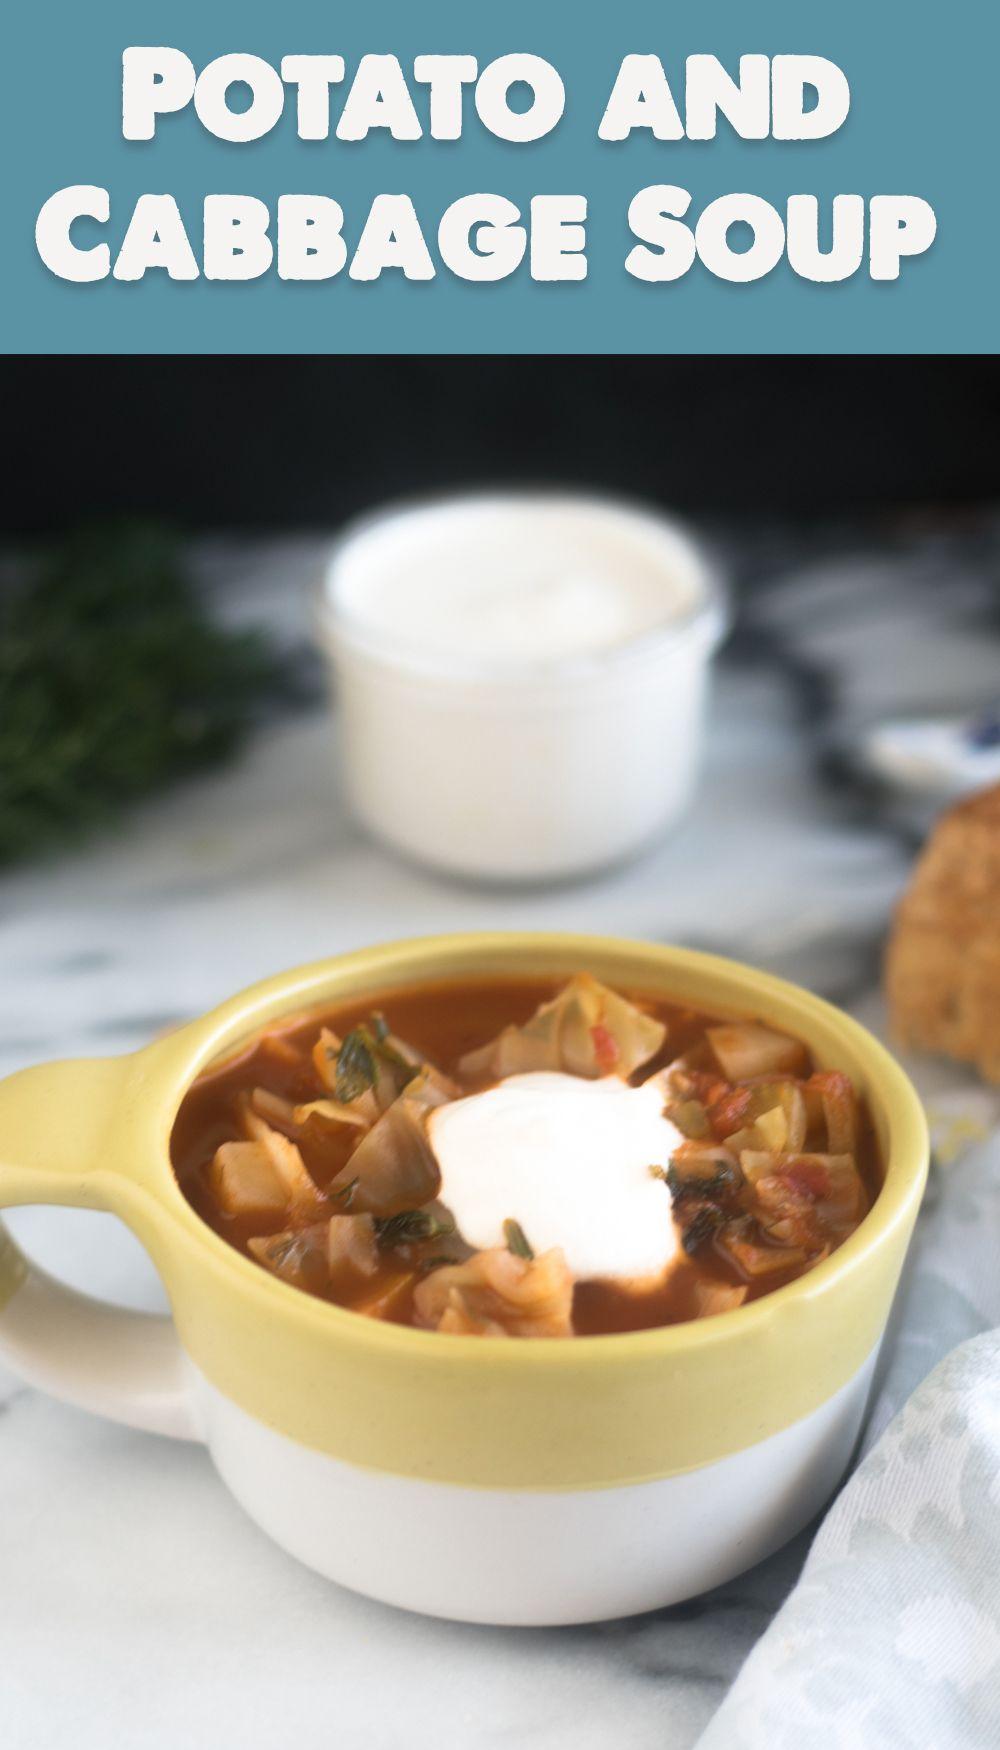 Potato And Cabbage Soup